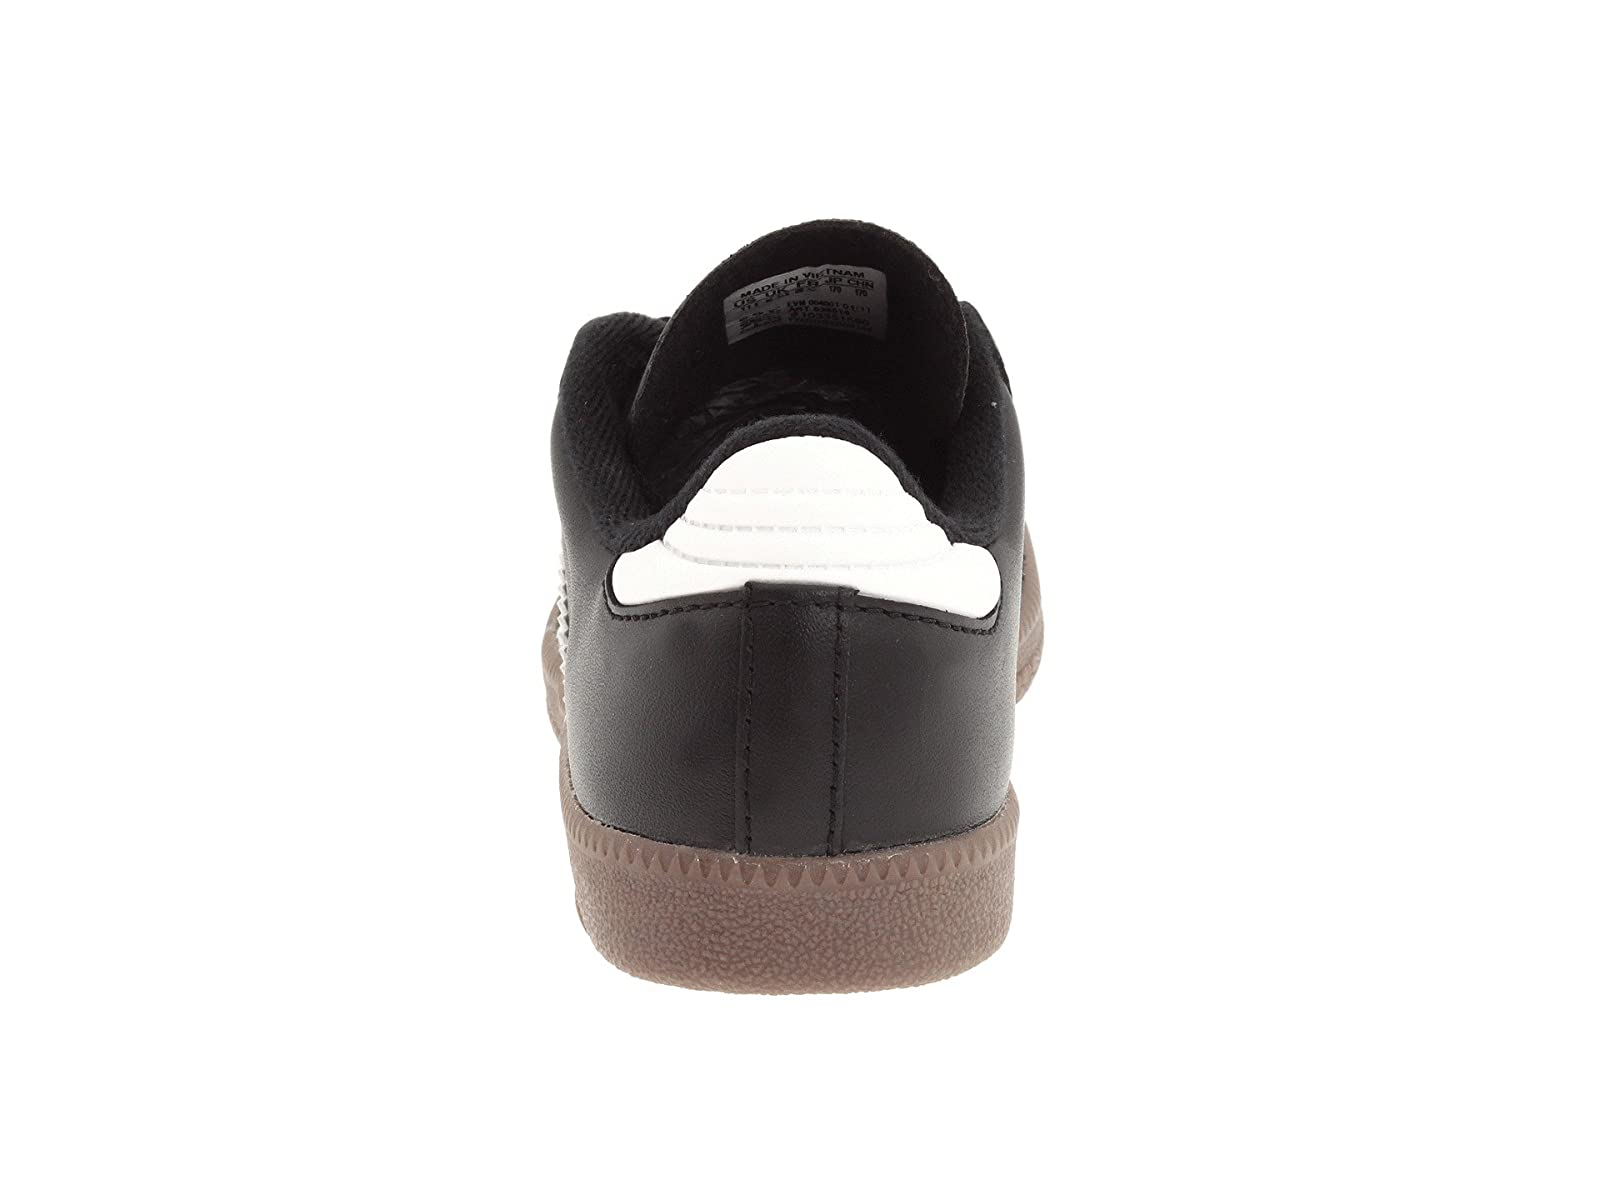 adidas enfants sambaclassic central (bébé (bébé (bébé / enfant / enfant) 713dac